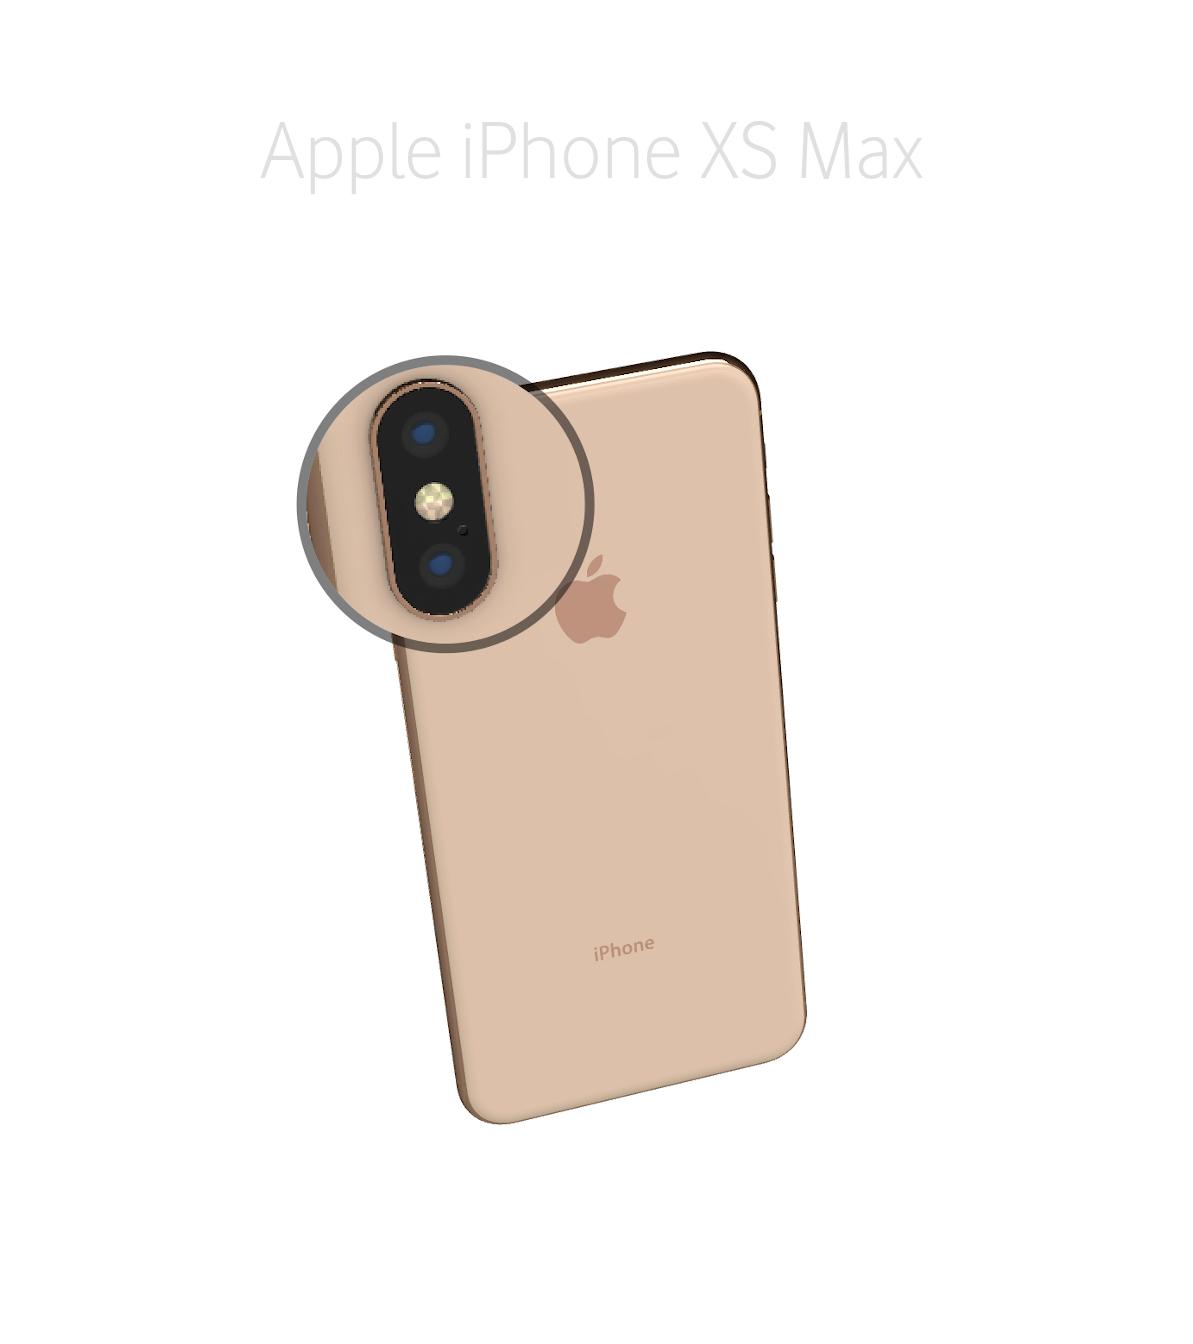 Laga mikrofon kamera iPhone Xs Max